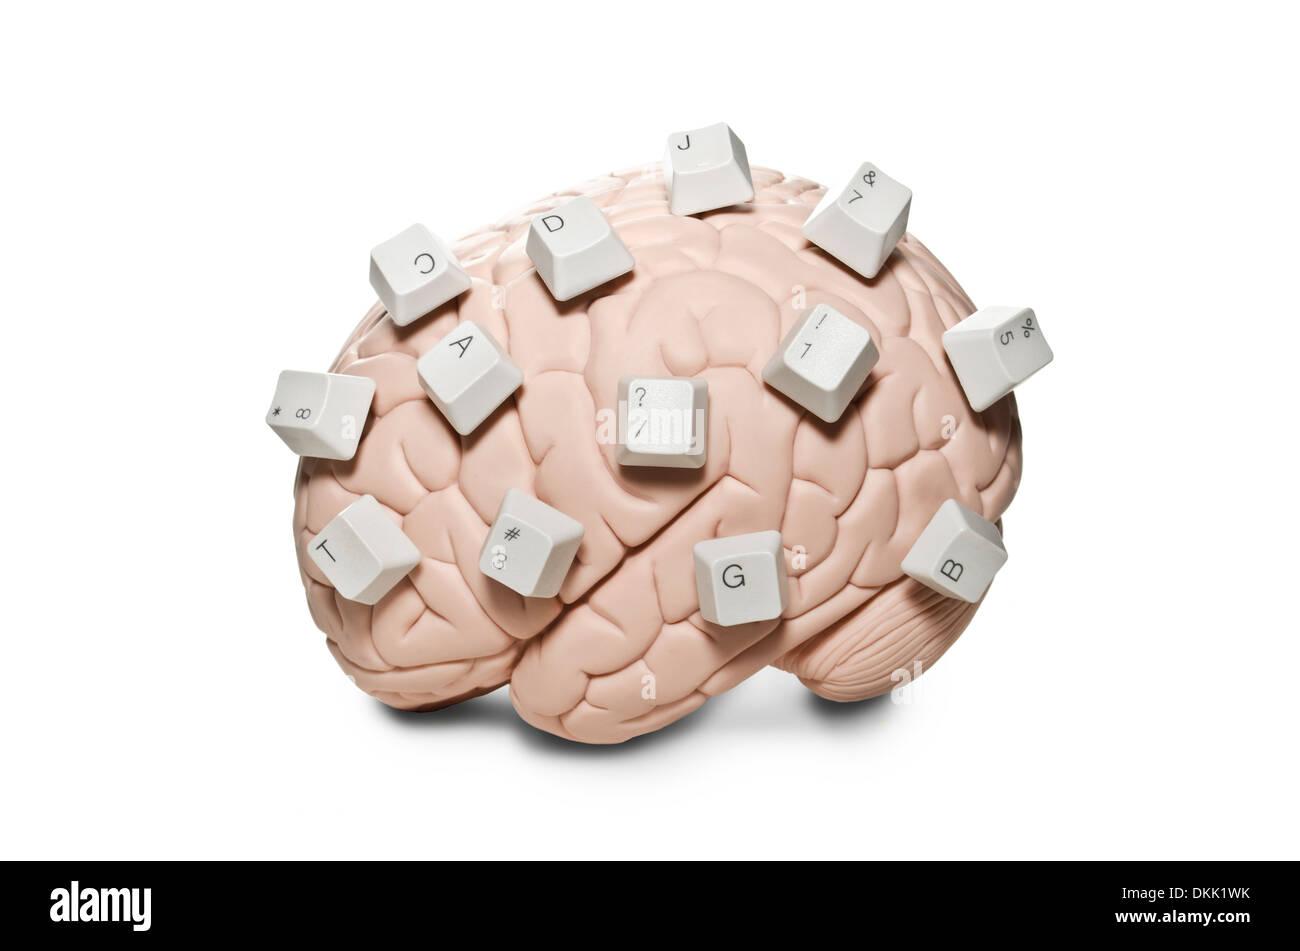 Brain with computer keys - Stock Image